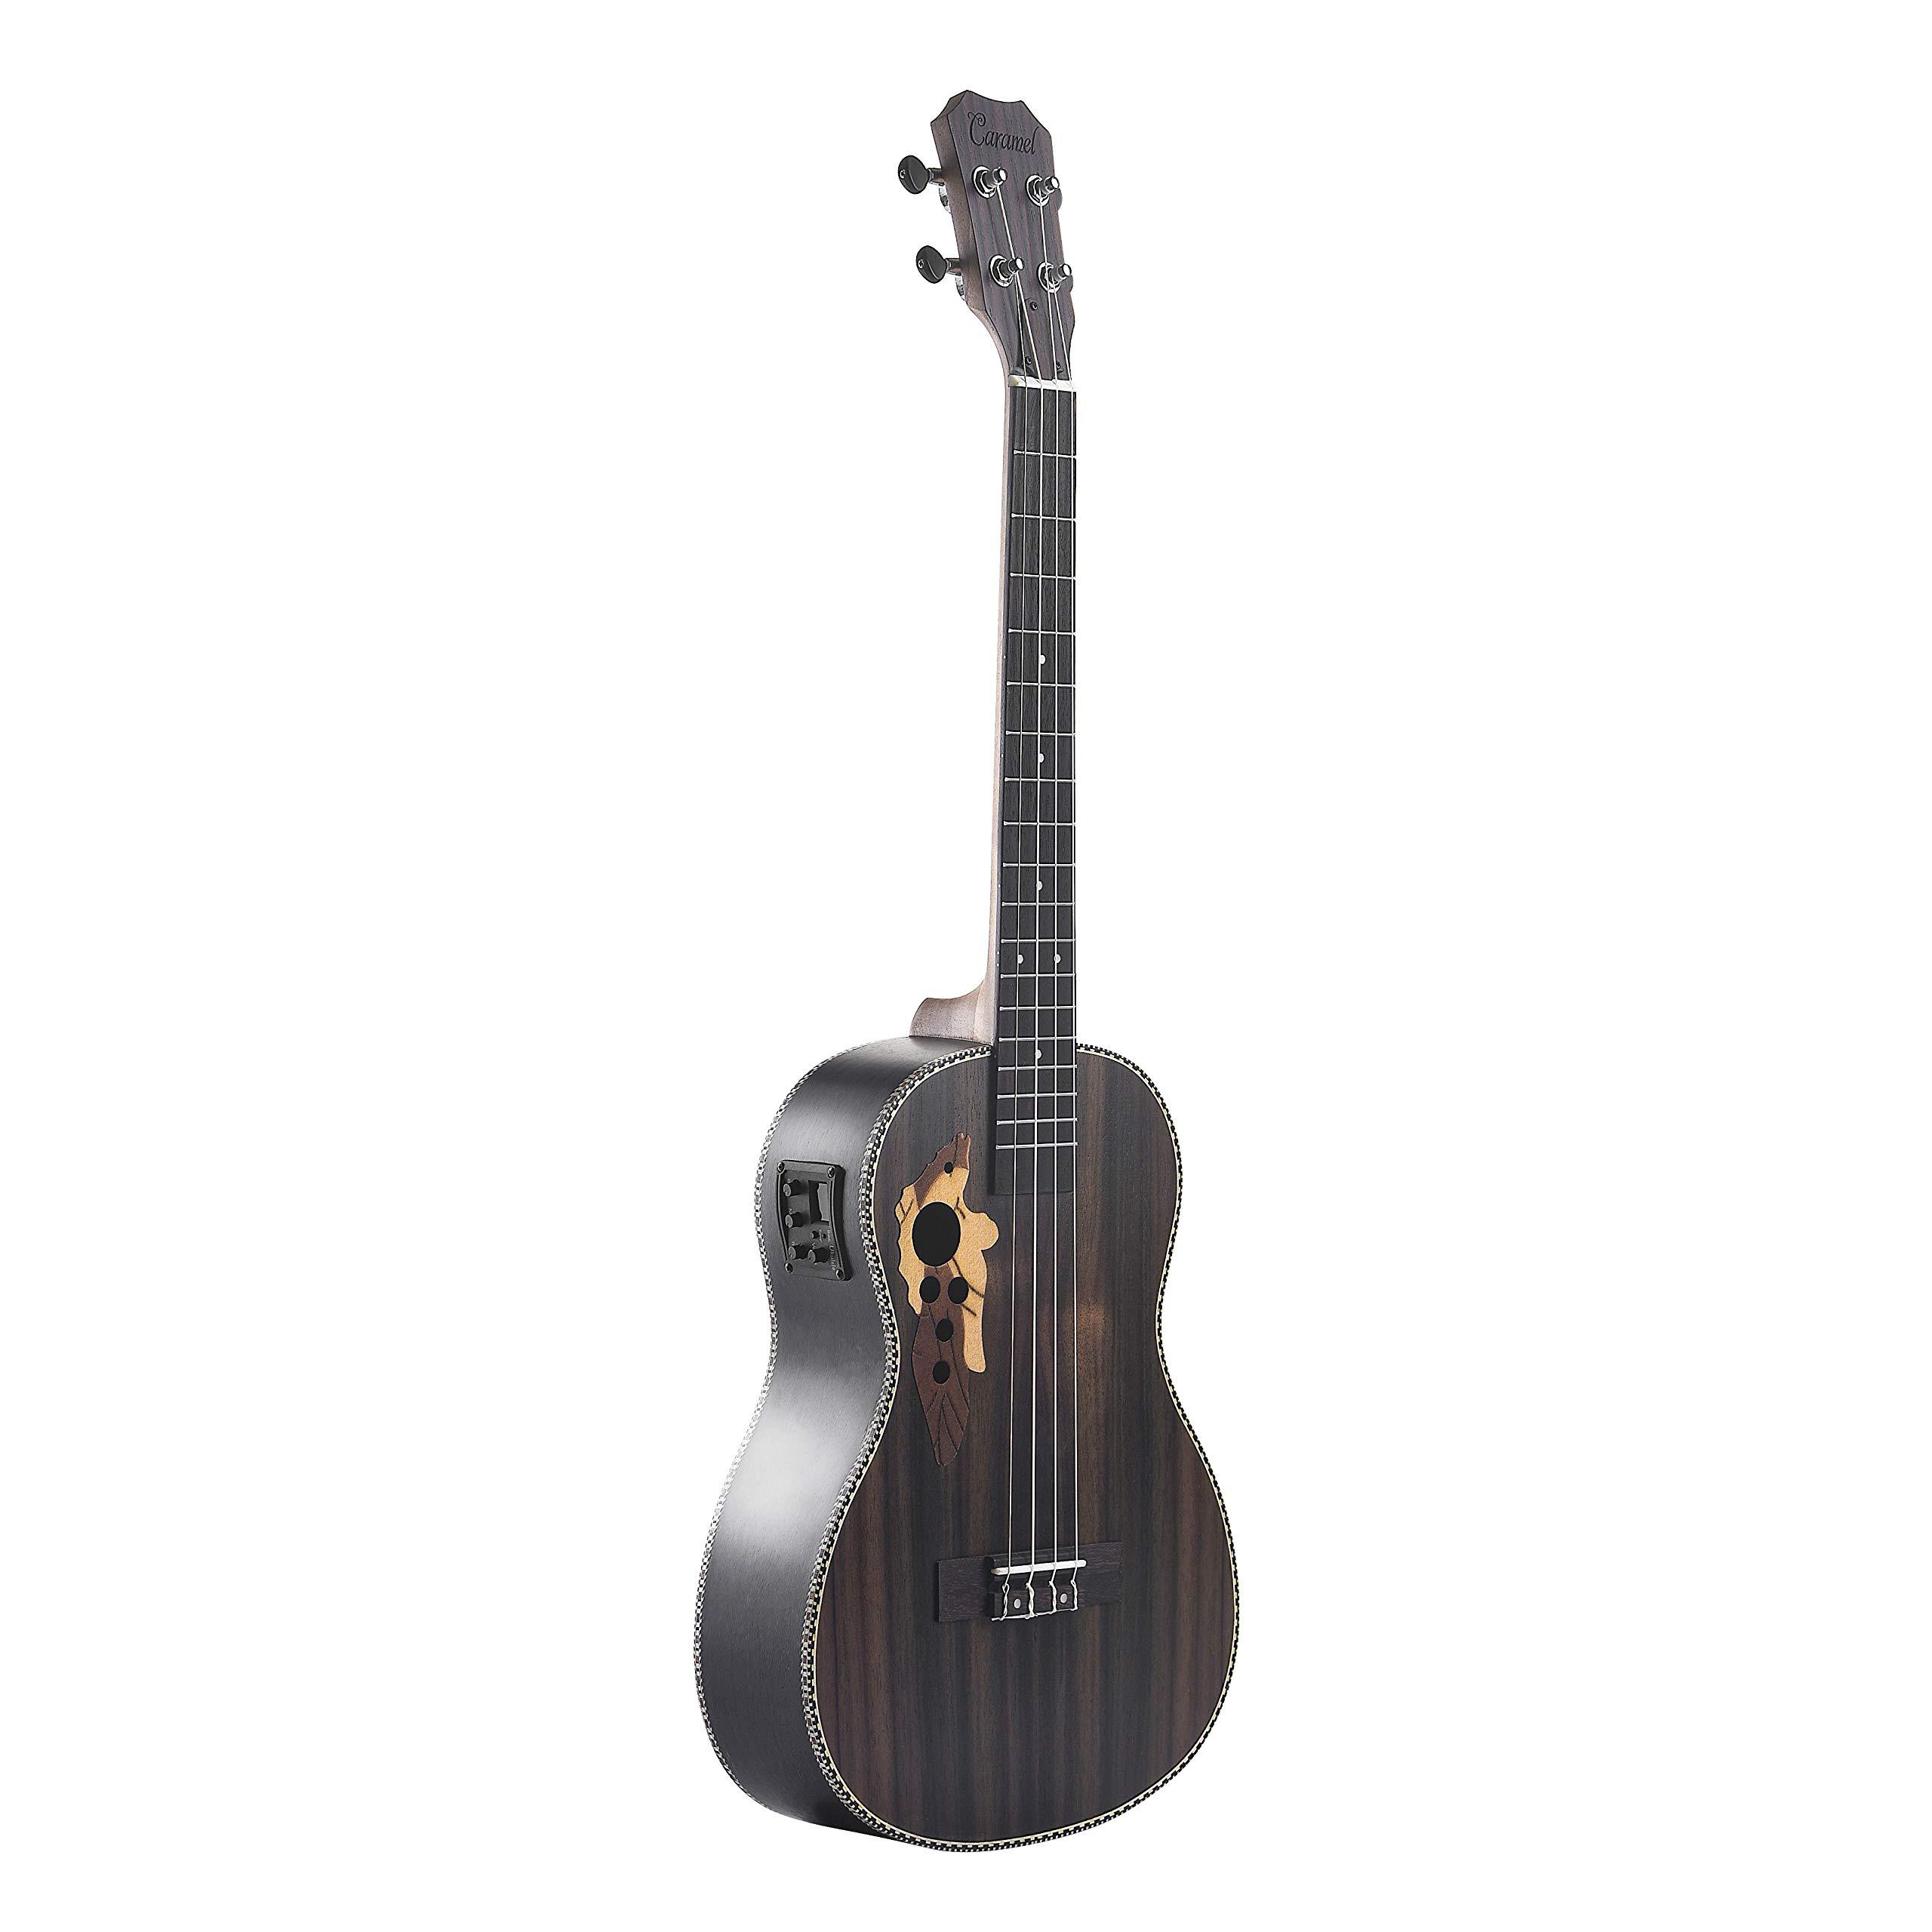 Caramel CB500 30 Inch All Rosewood Baritone Acoustic Electric Ukulele With Truss Rod